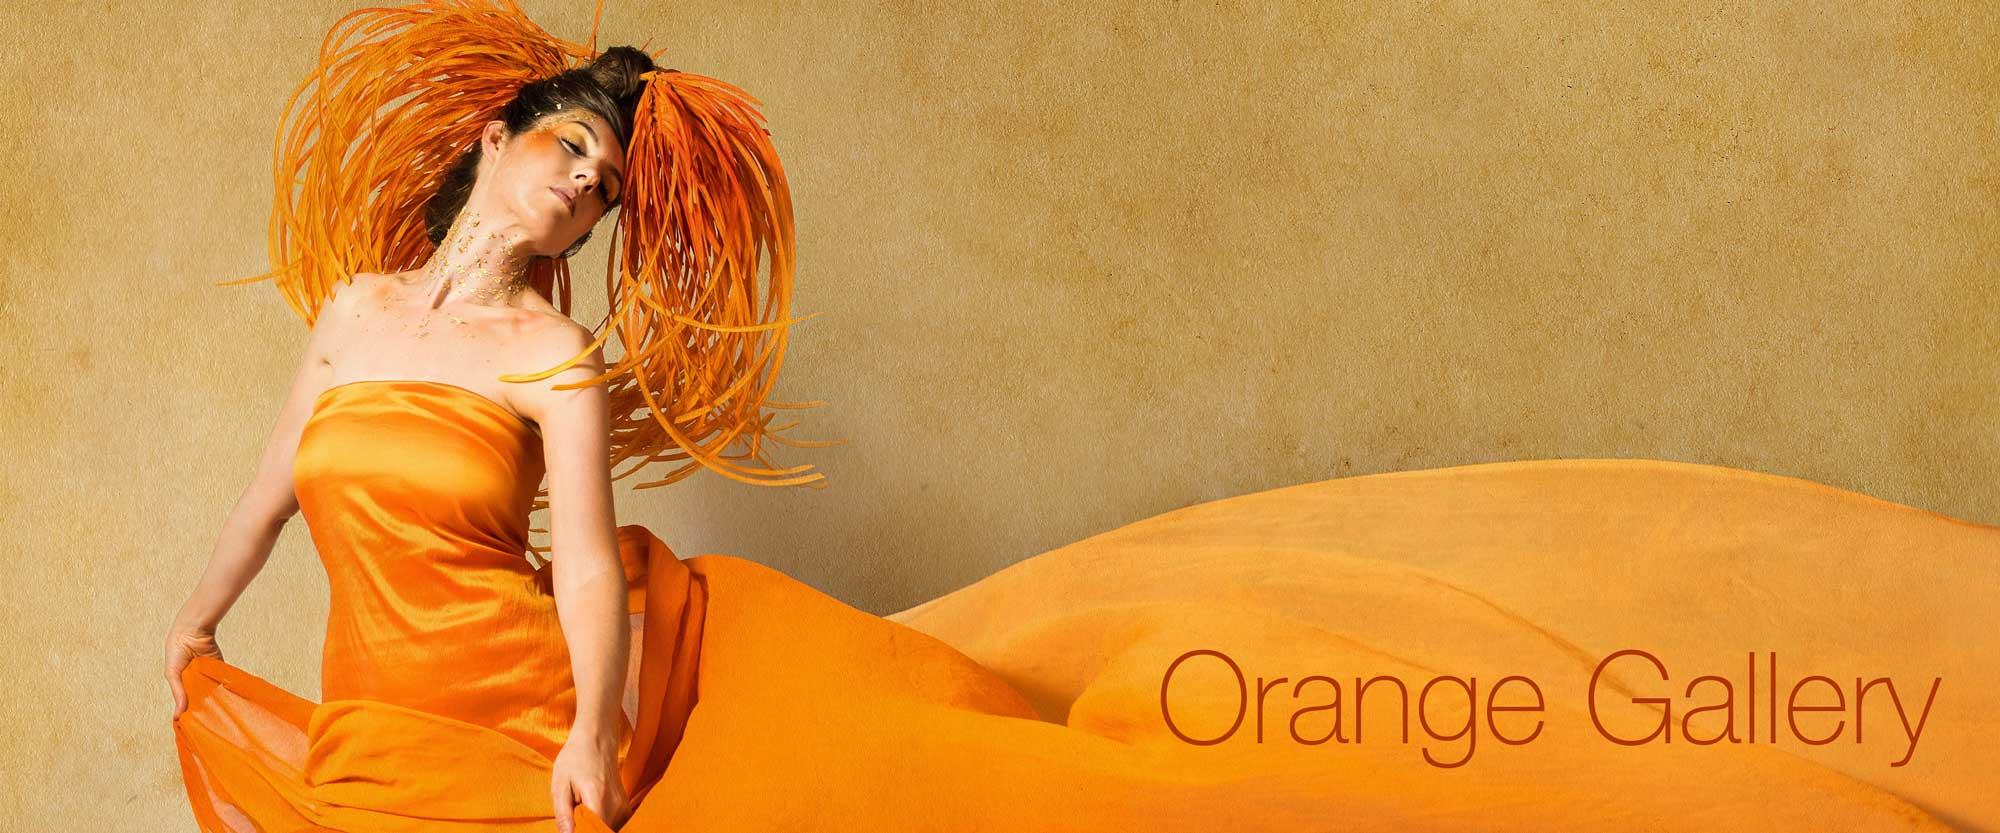 Laüra Hollick's Orange Gallery